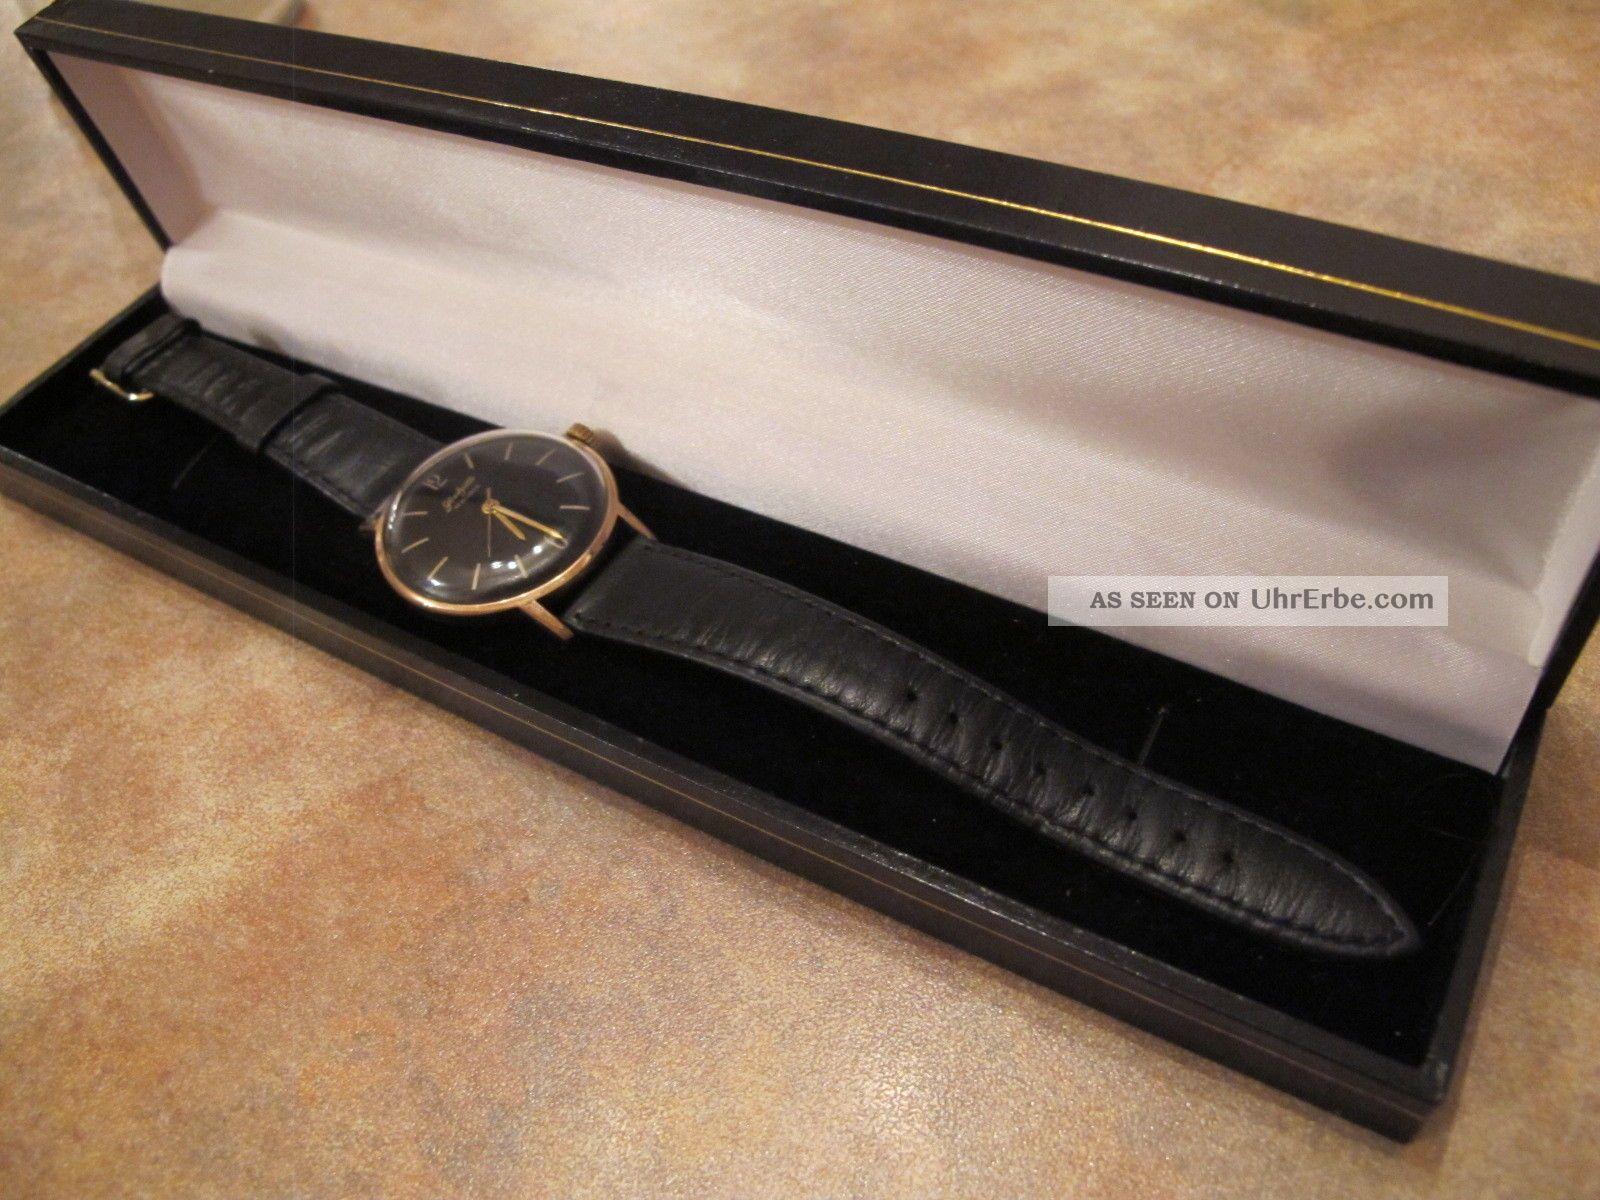 Glashütte Armbanduhr 17 Rubis Armbanduhren Bild